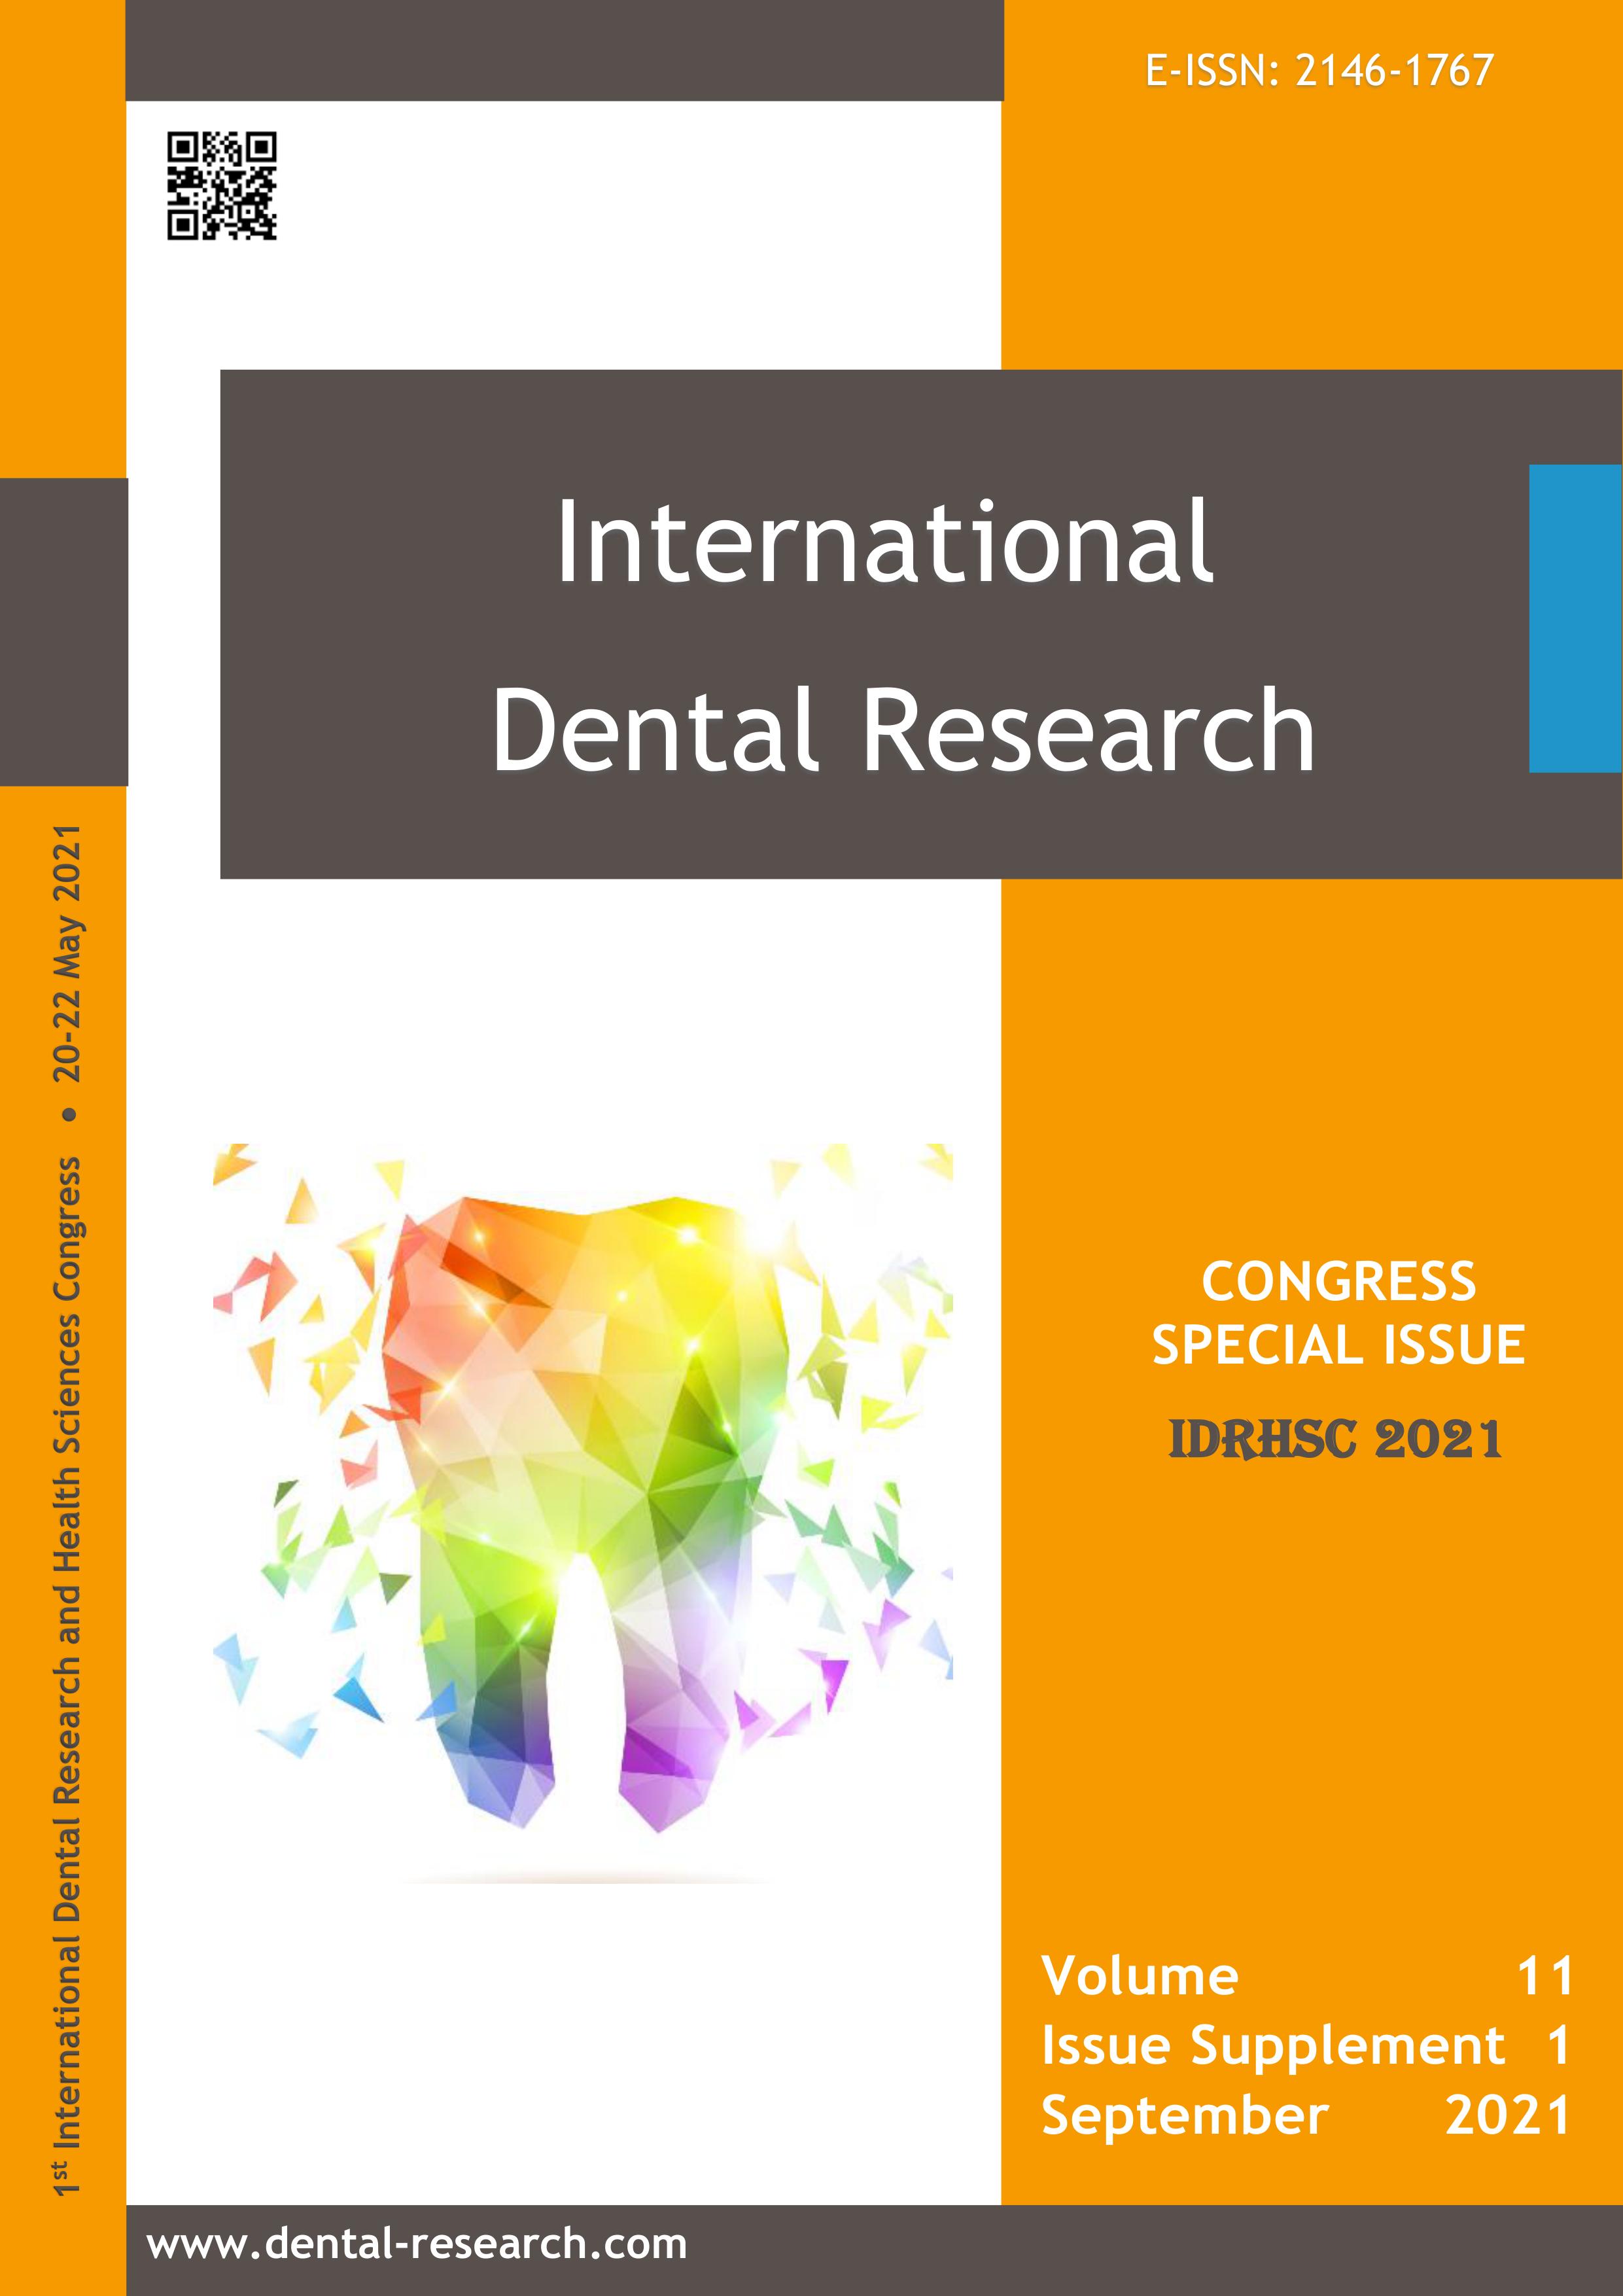 Vol 11 No Supplement 1 (2021): International Dental Research